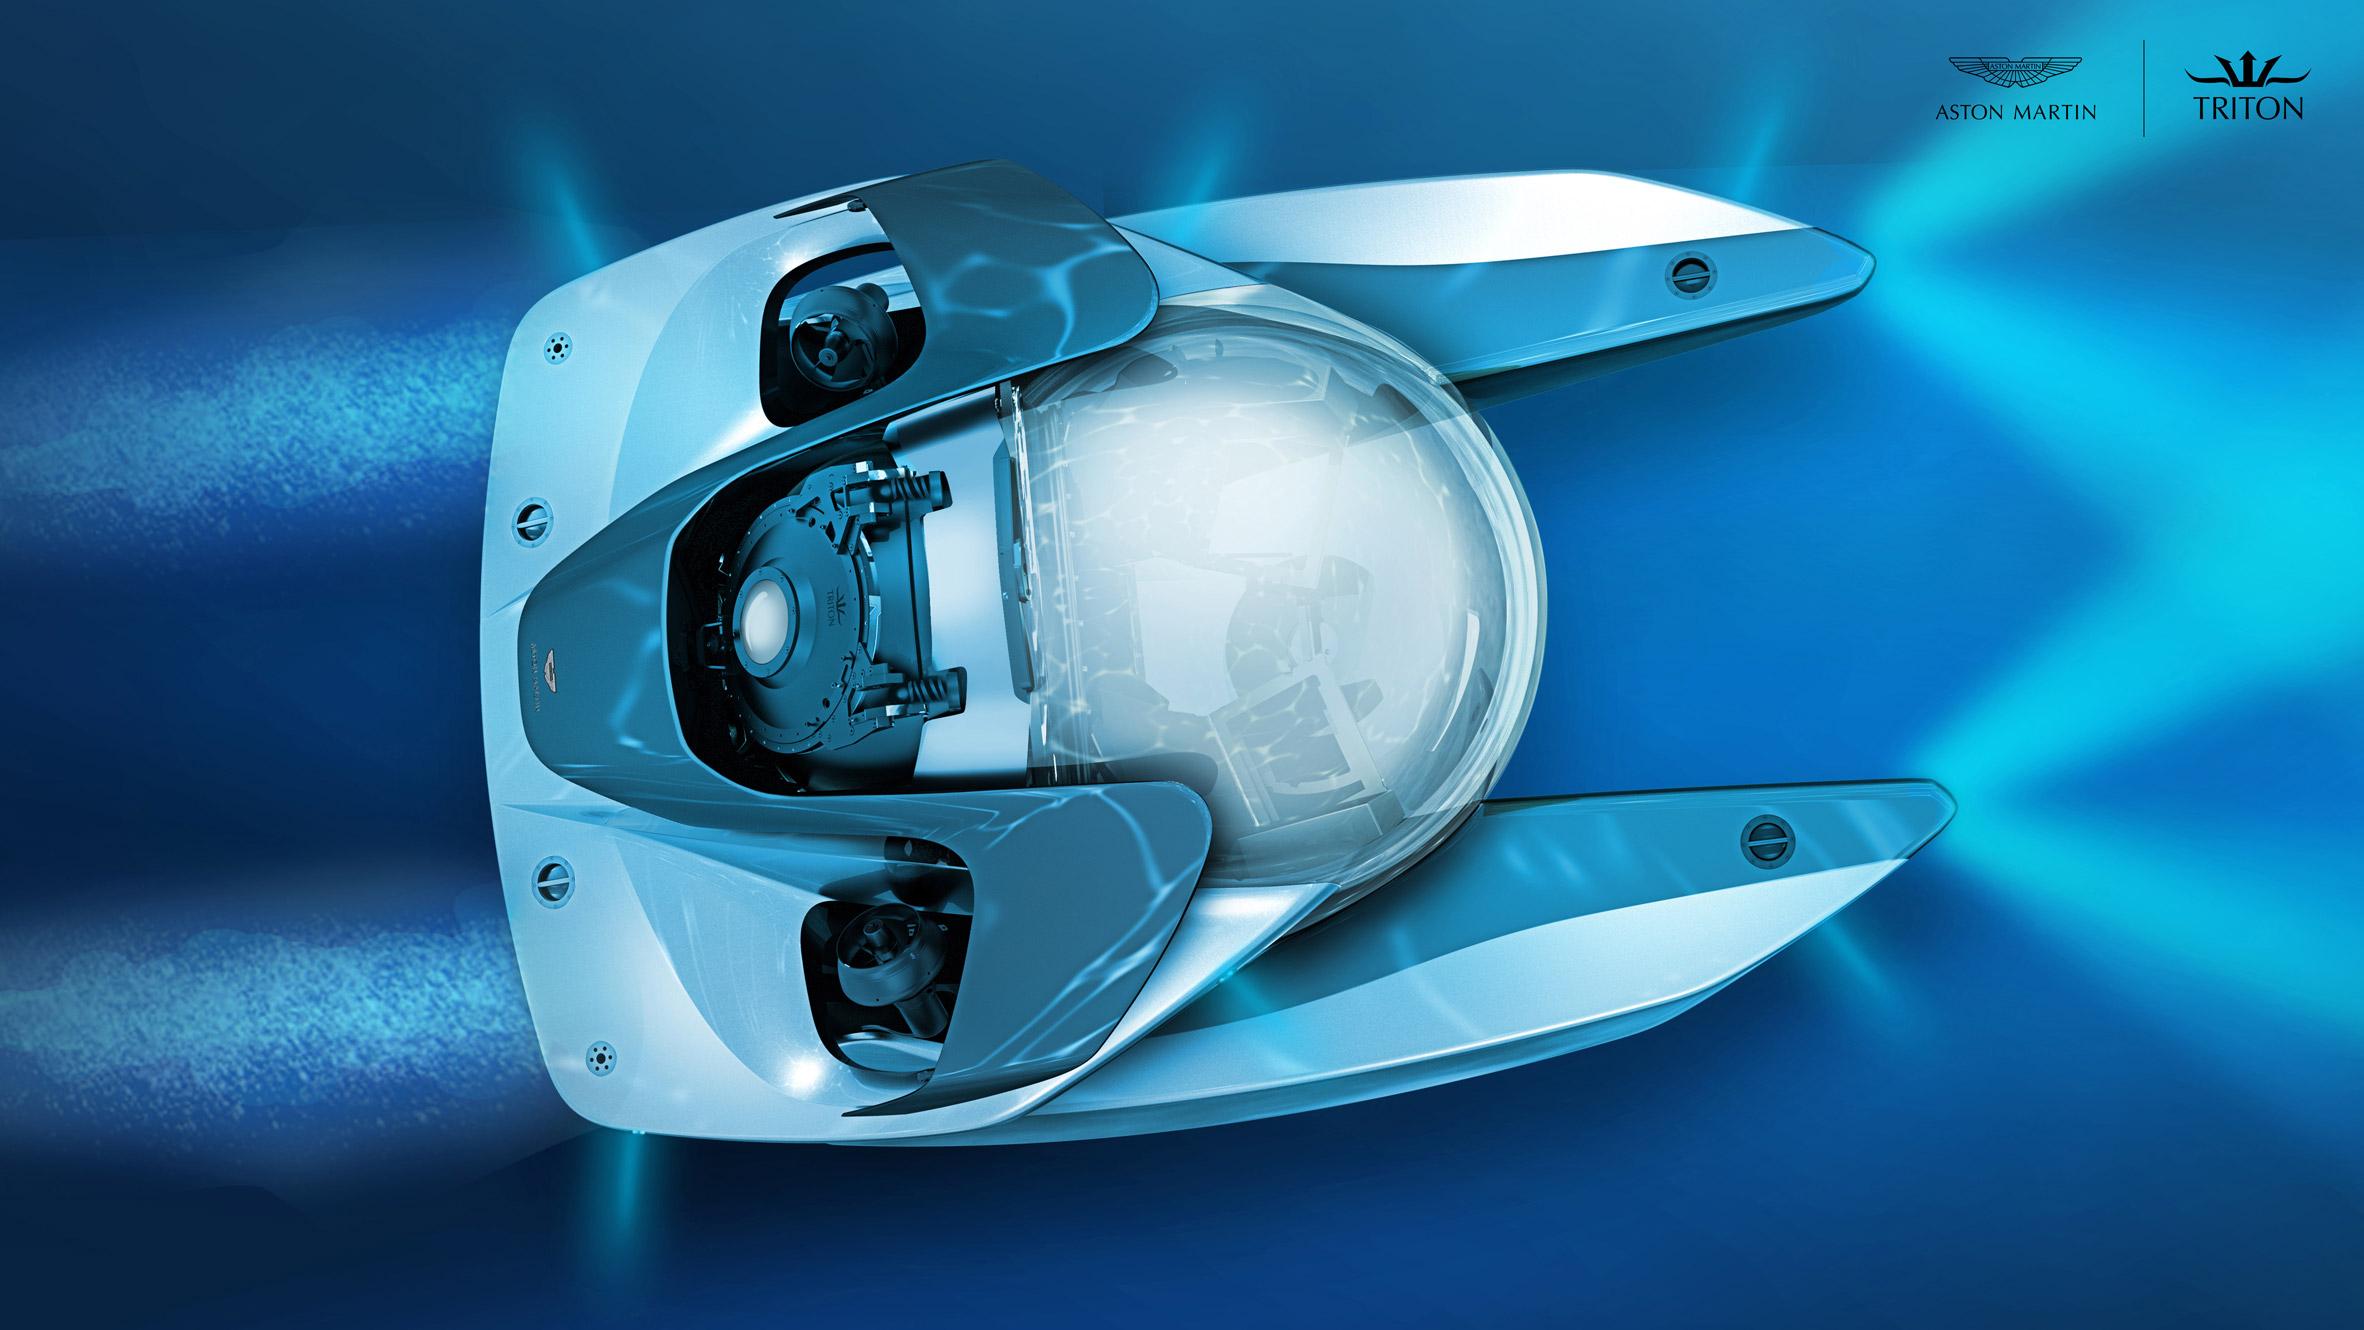 Aston Martin reveals plans for $4 million luxury submarine